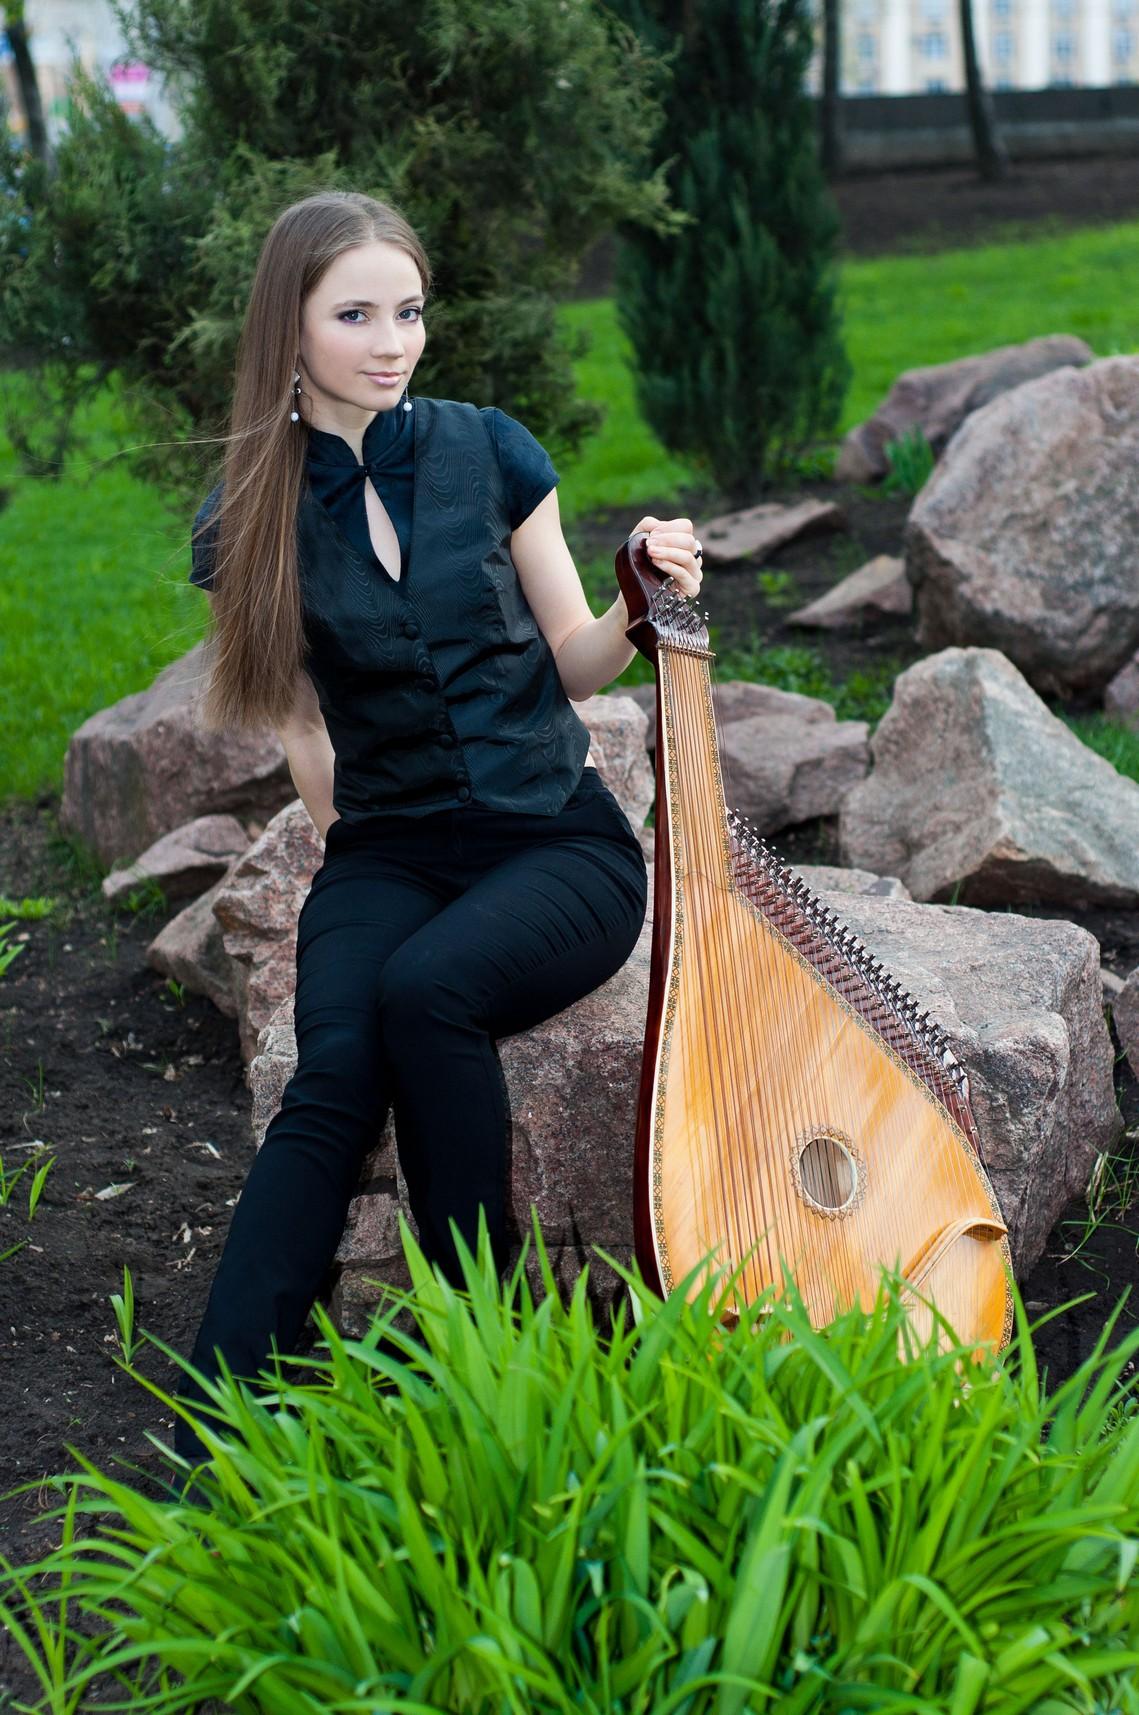 Artystka muzyczna Marina Terlecka